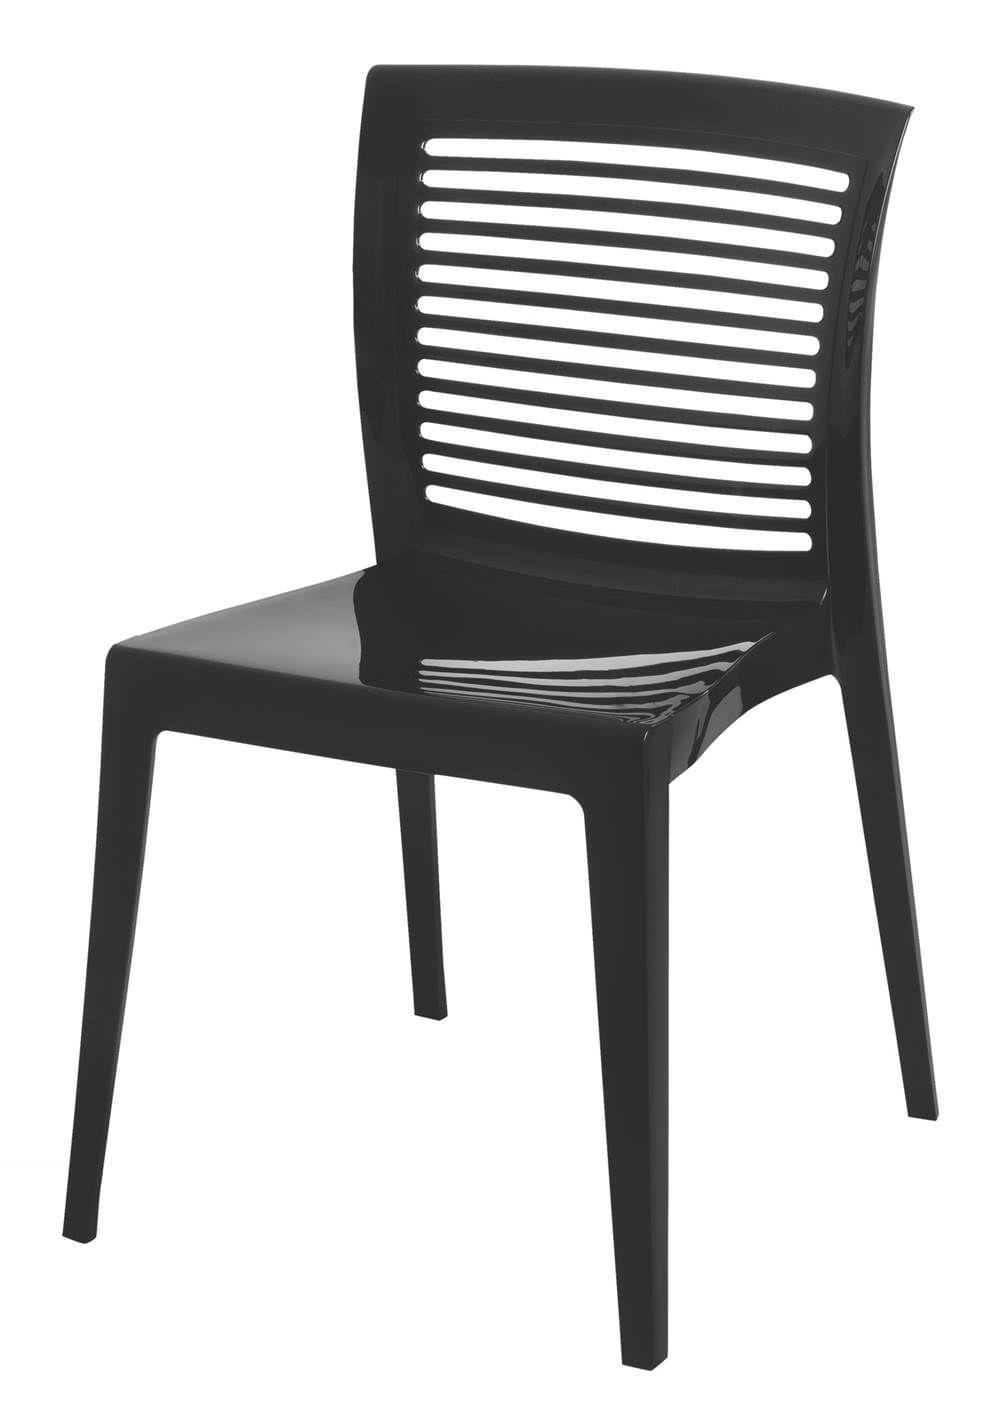 Cadeira Victoria Encosto Vazado Cor Preto - 21711